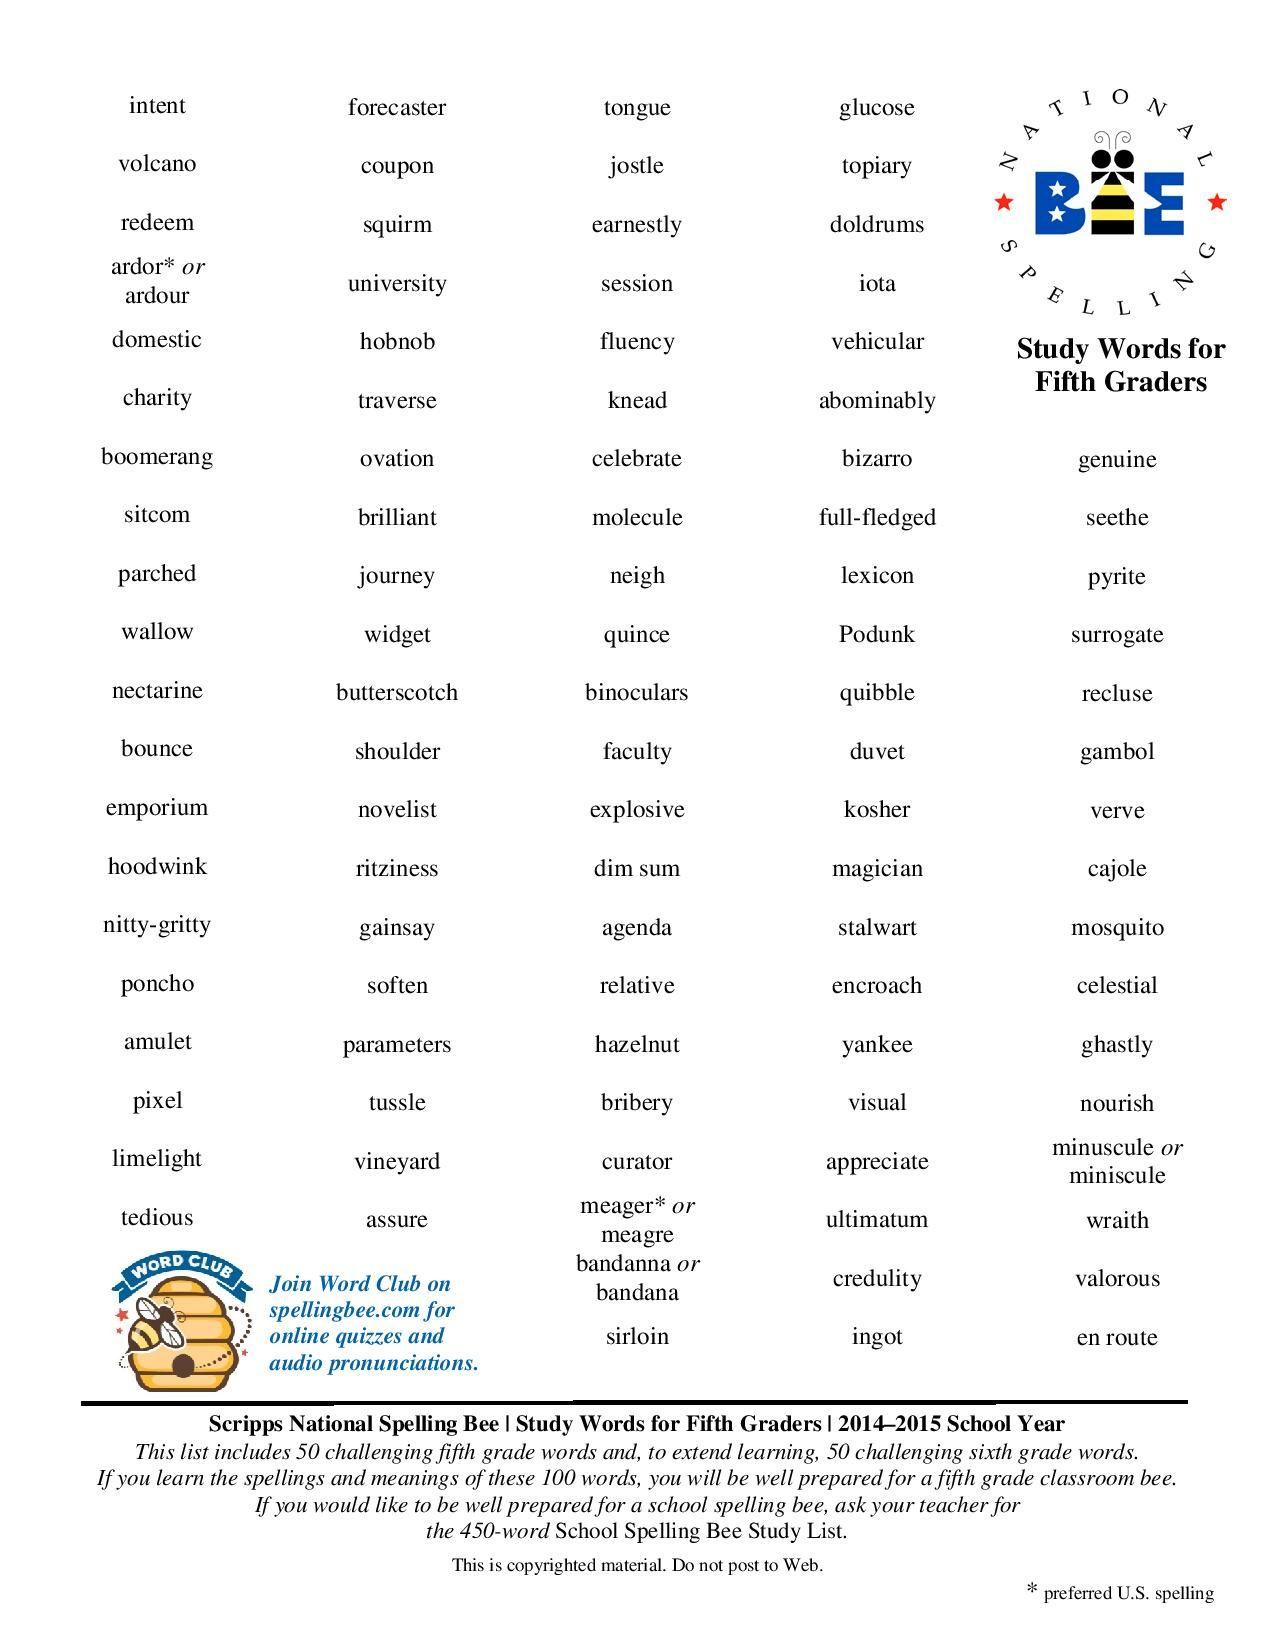 5th Grade Spelling Bee Words